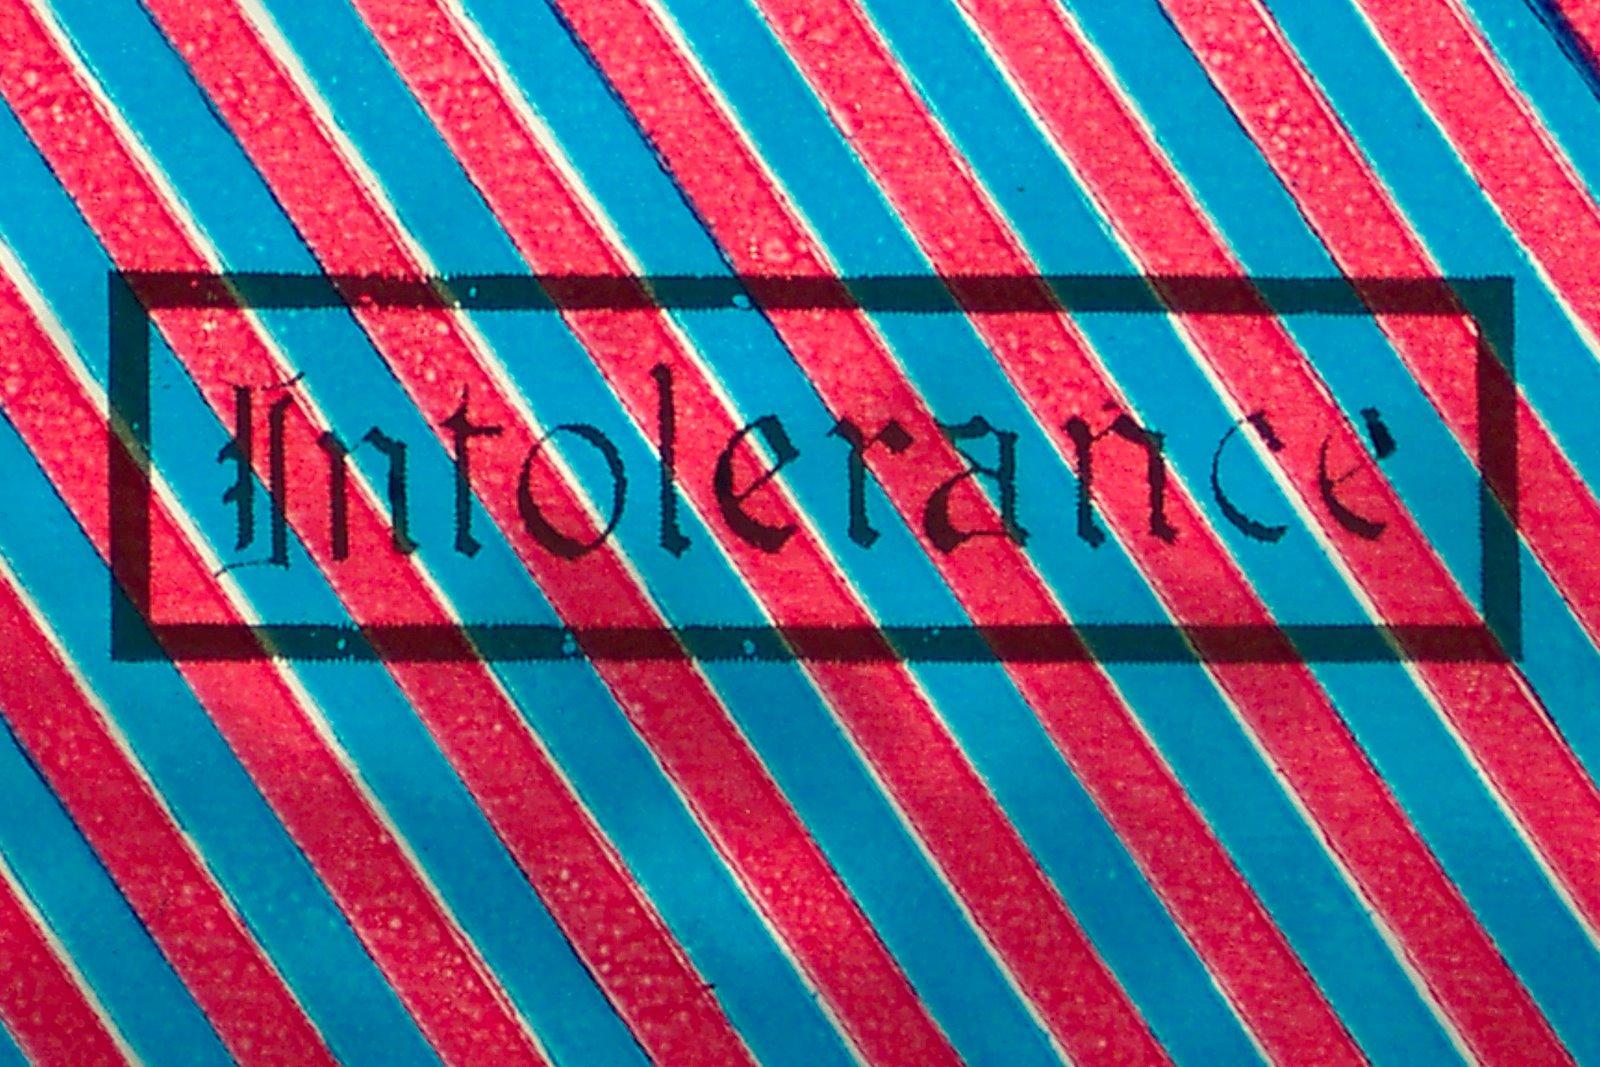 [intolerance.jpg]